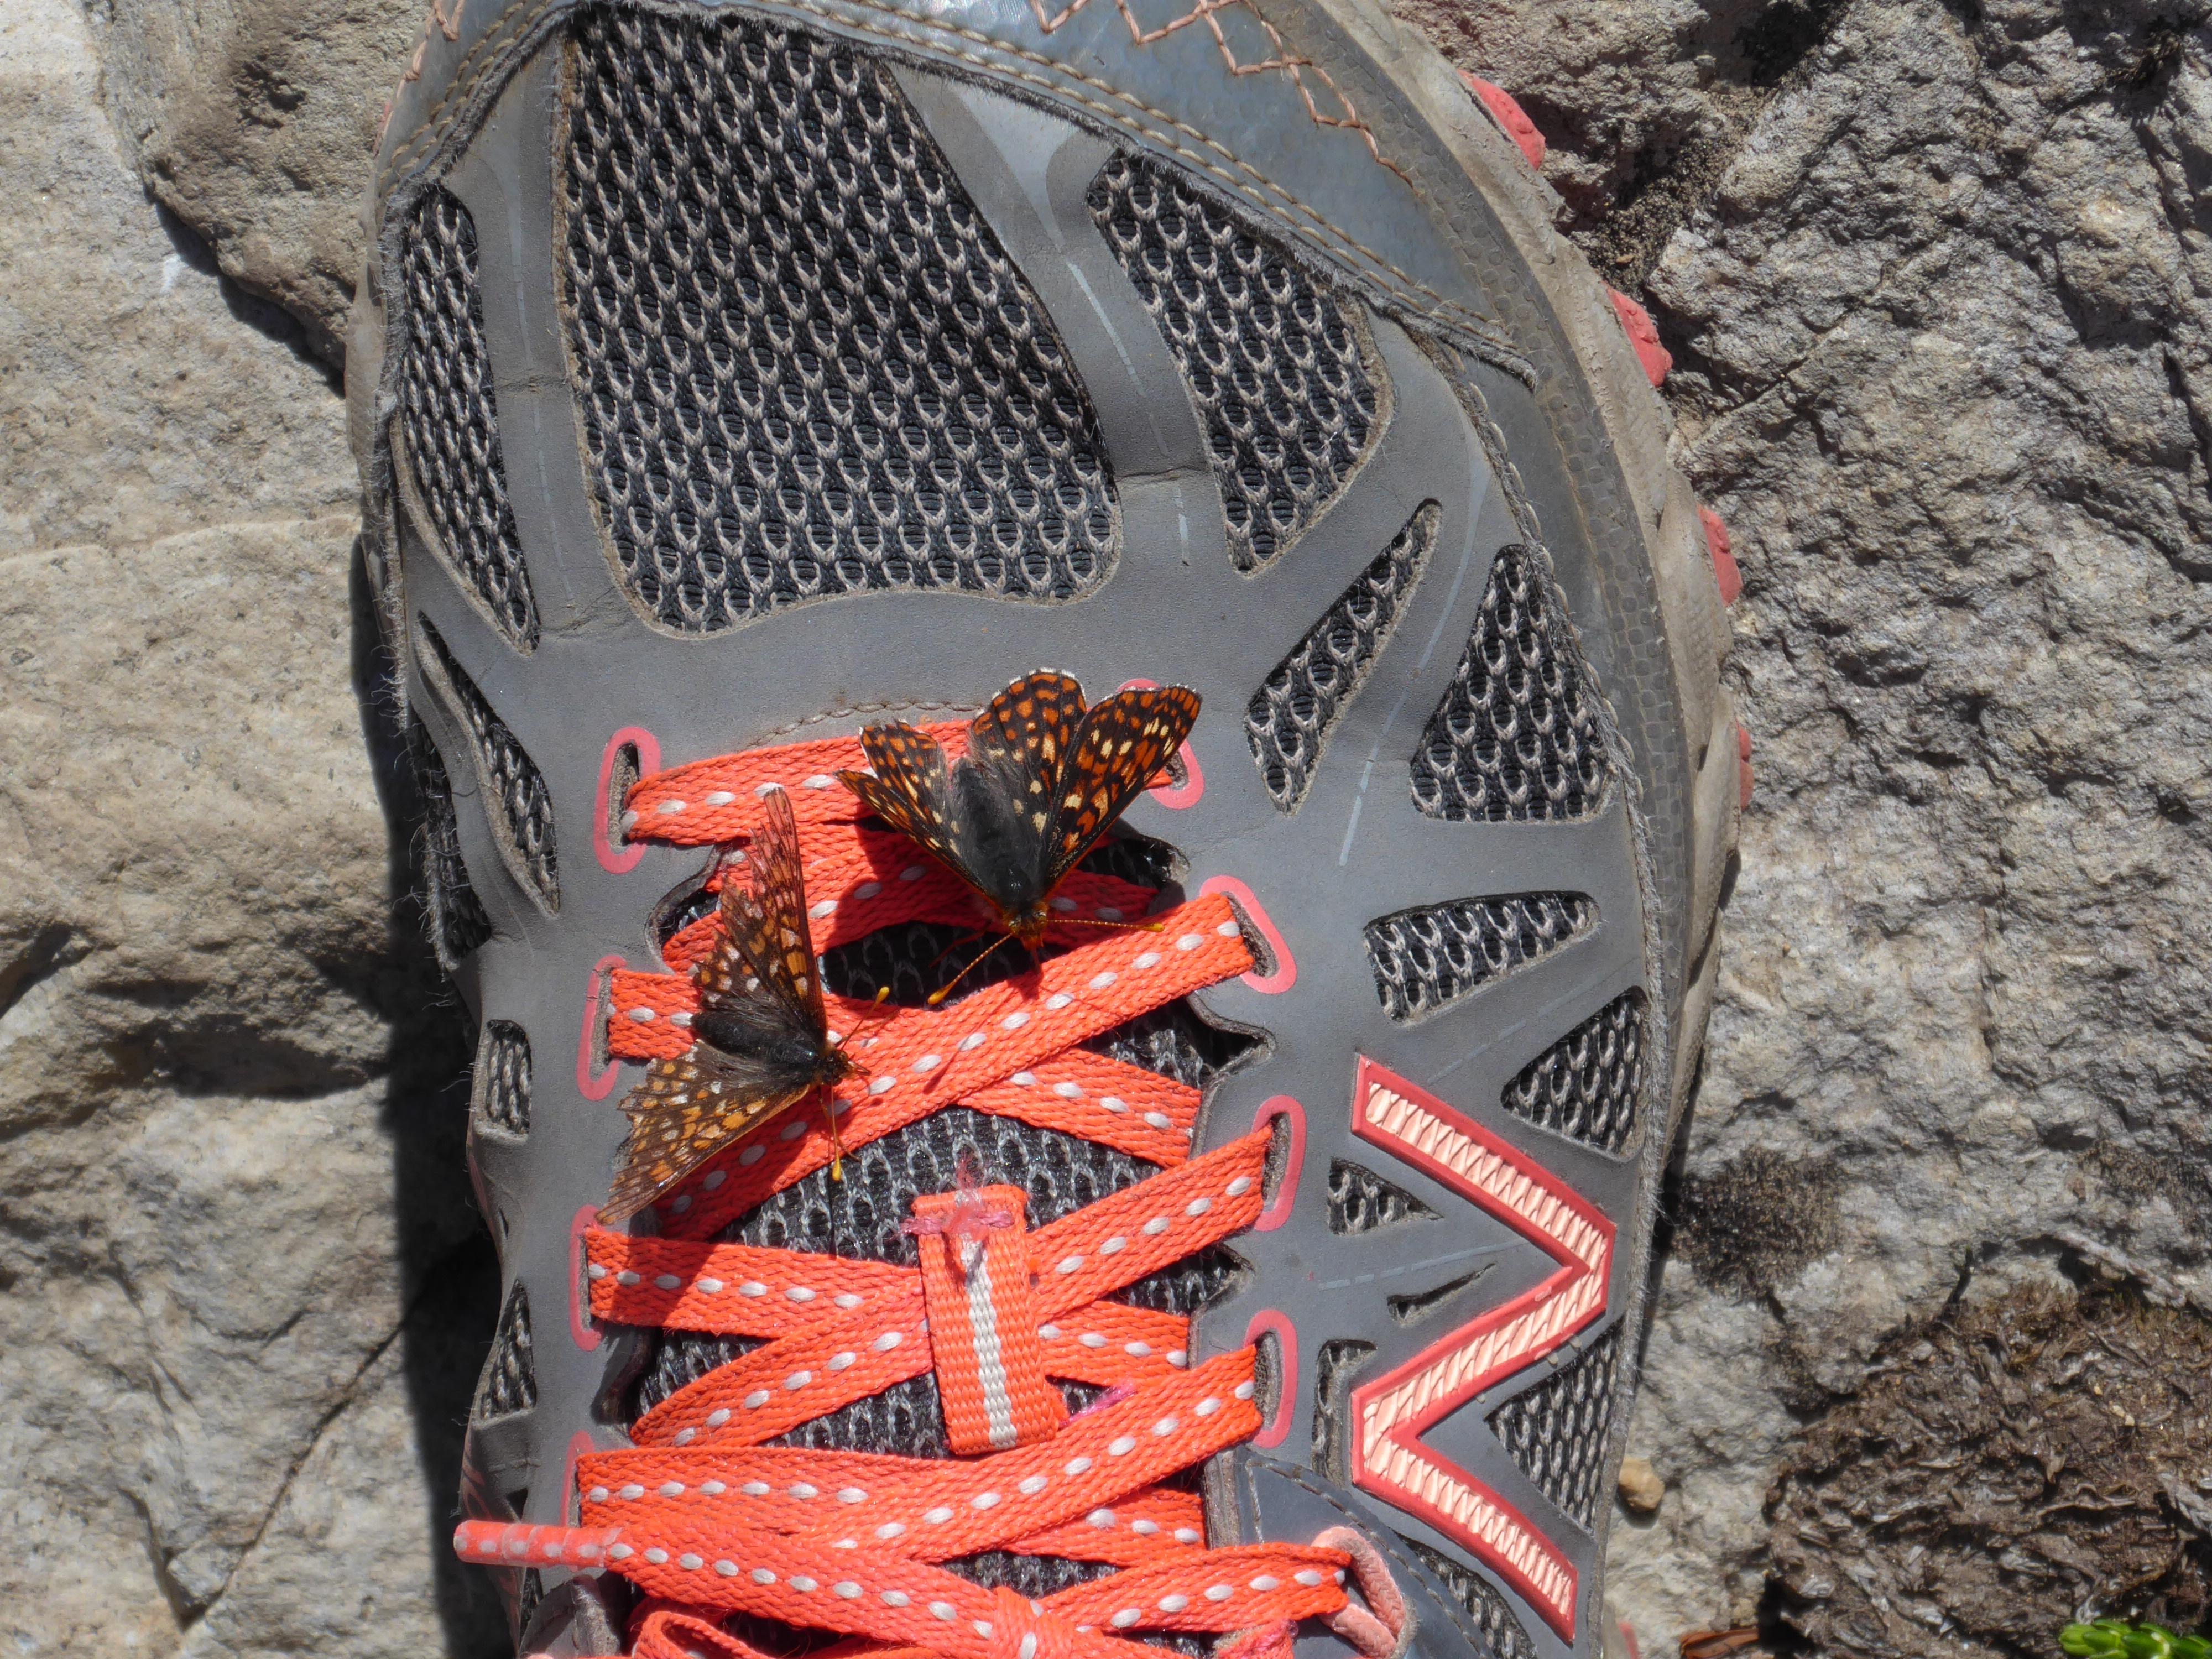 butterflies on my shoe luminex